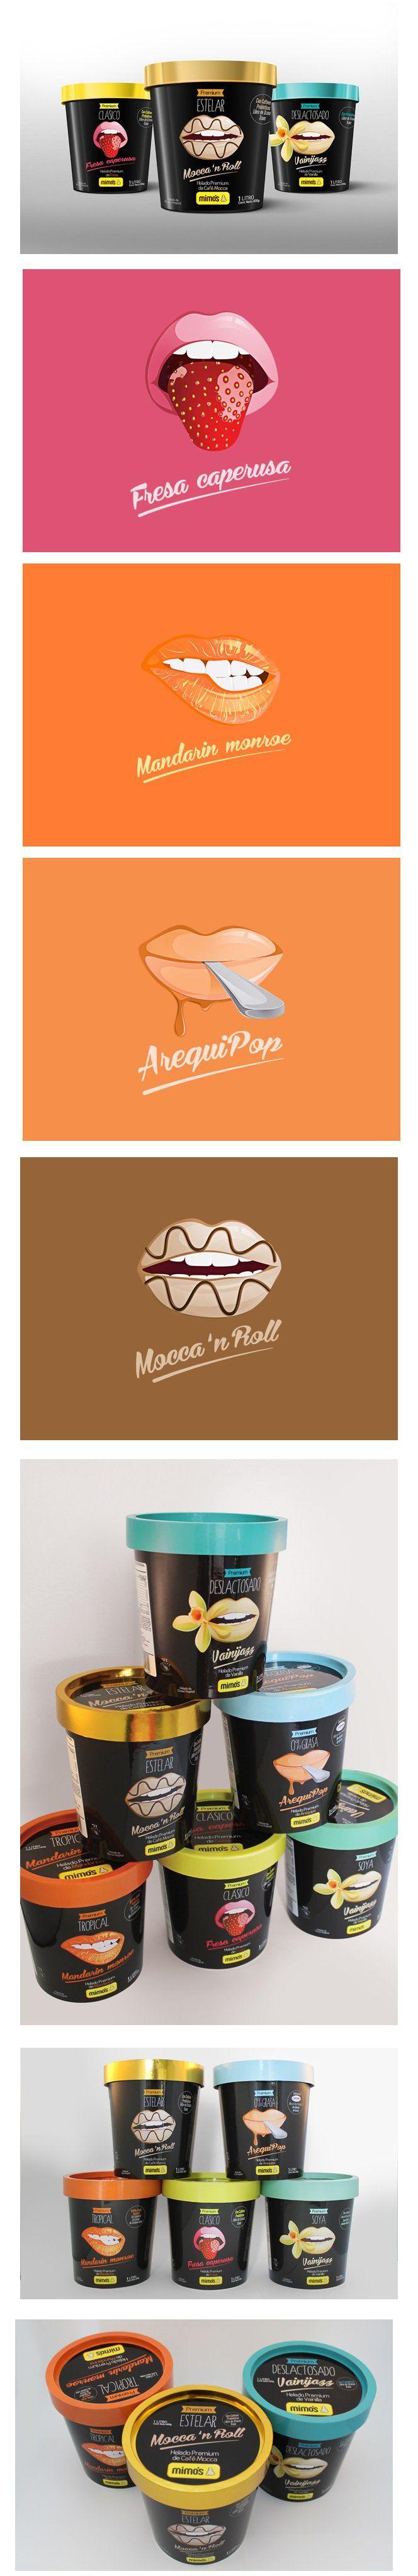 mimos ice-cream